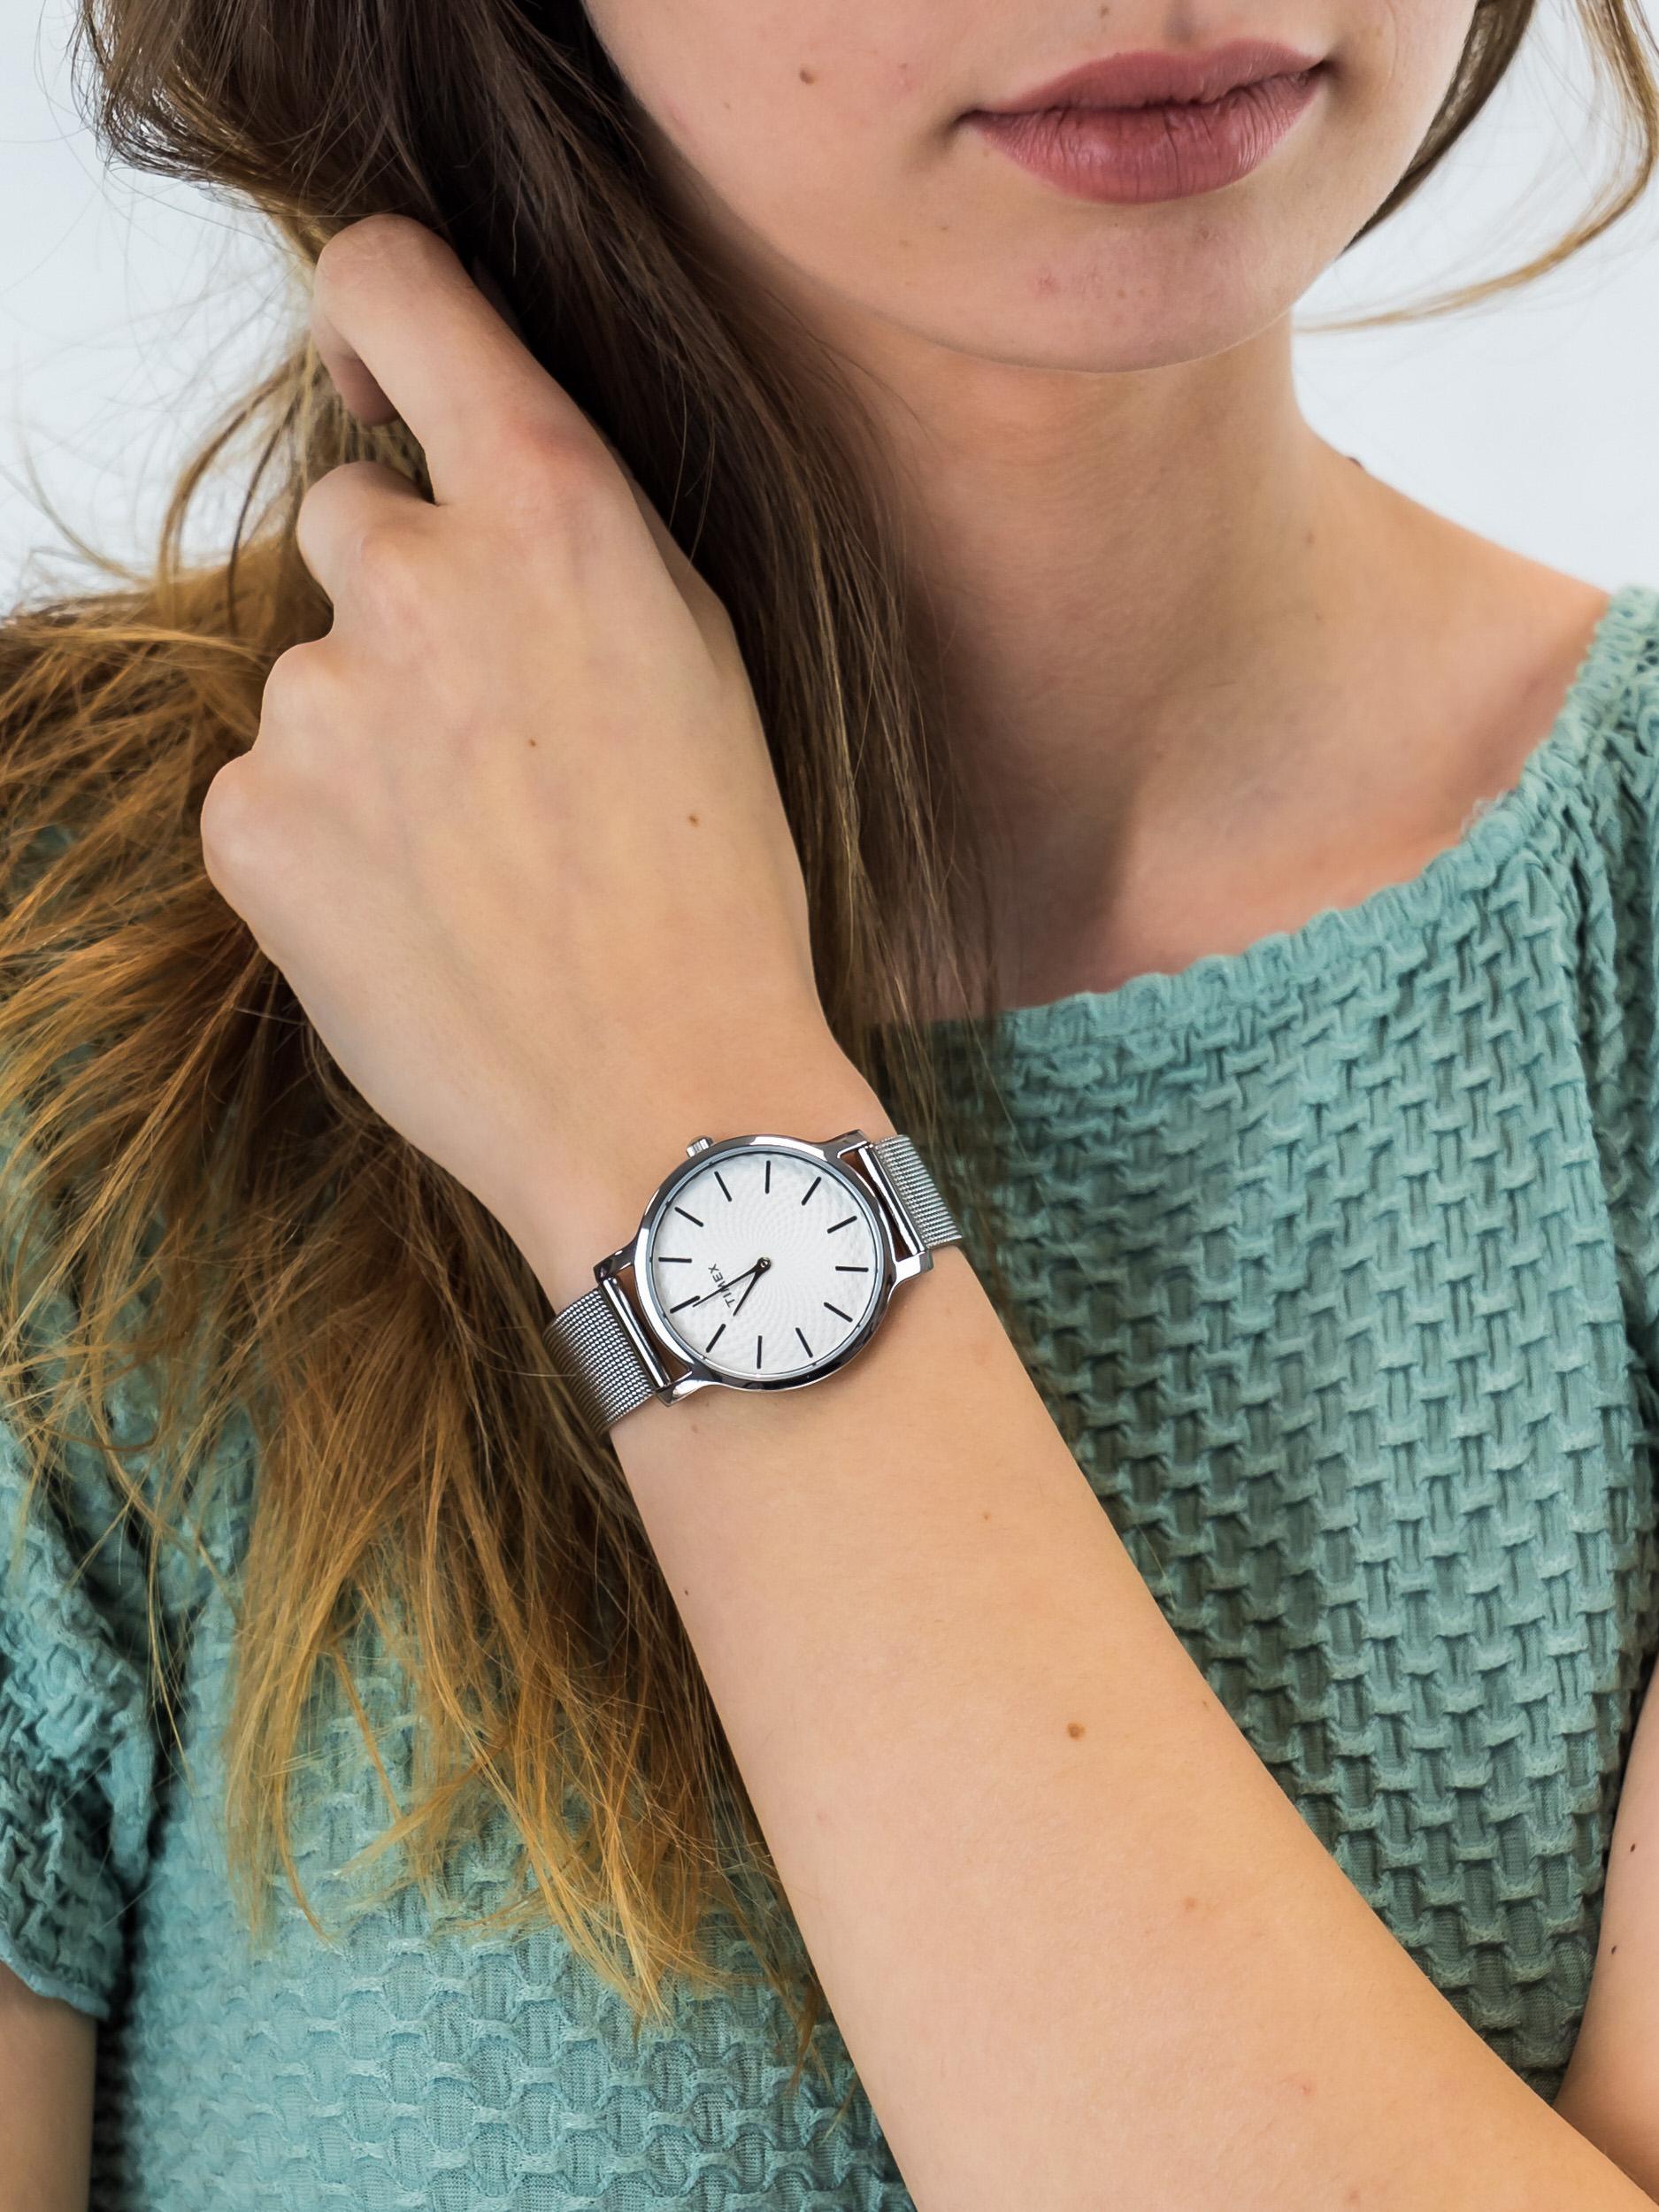 Timex TW2R36200 damski zegarek Metropolitan bransoleta